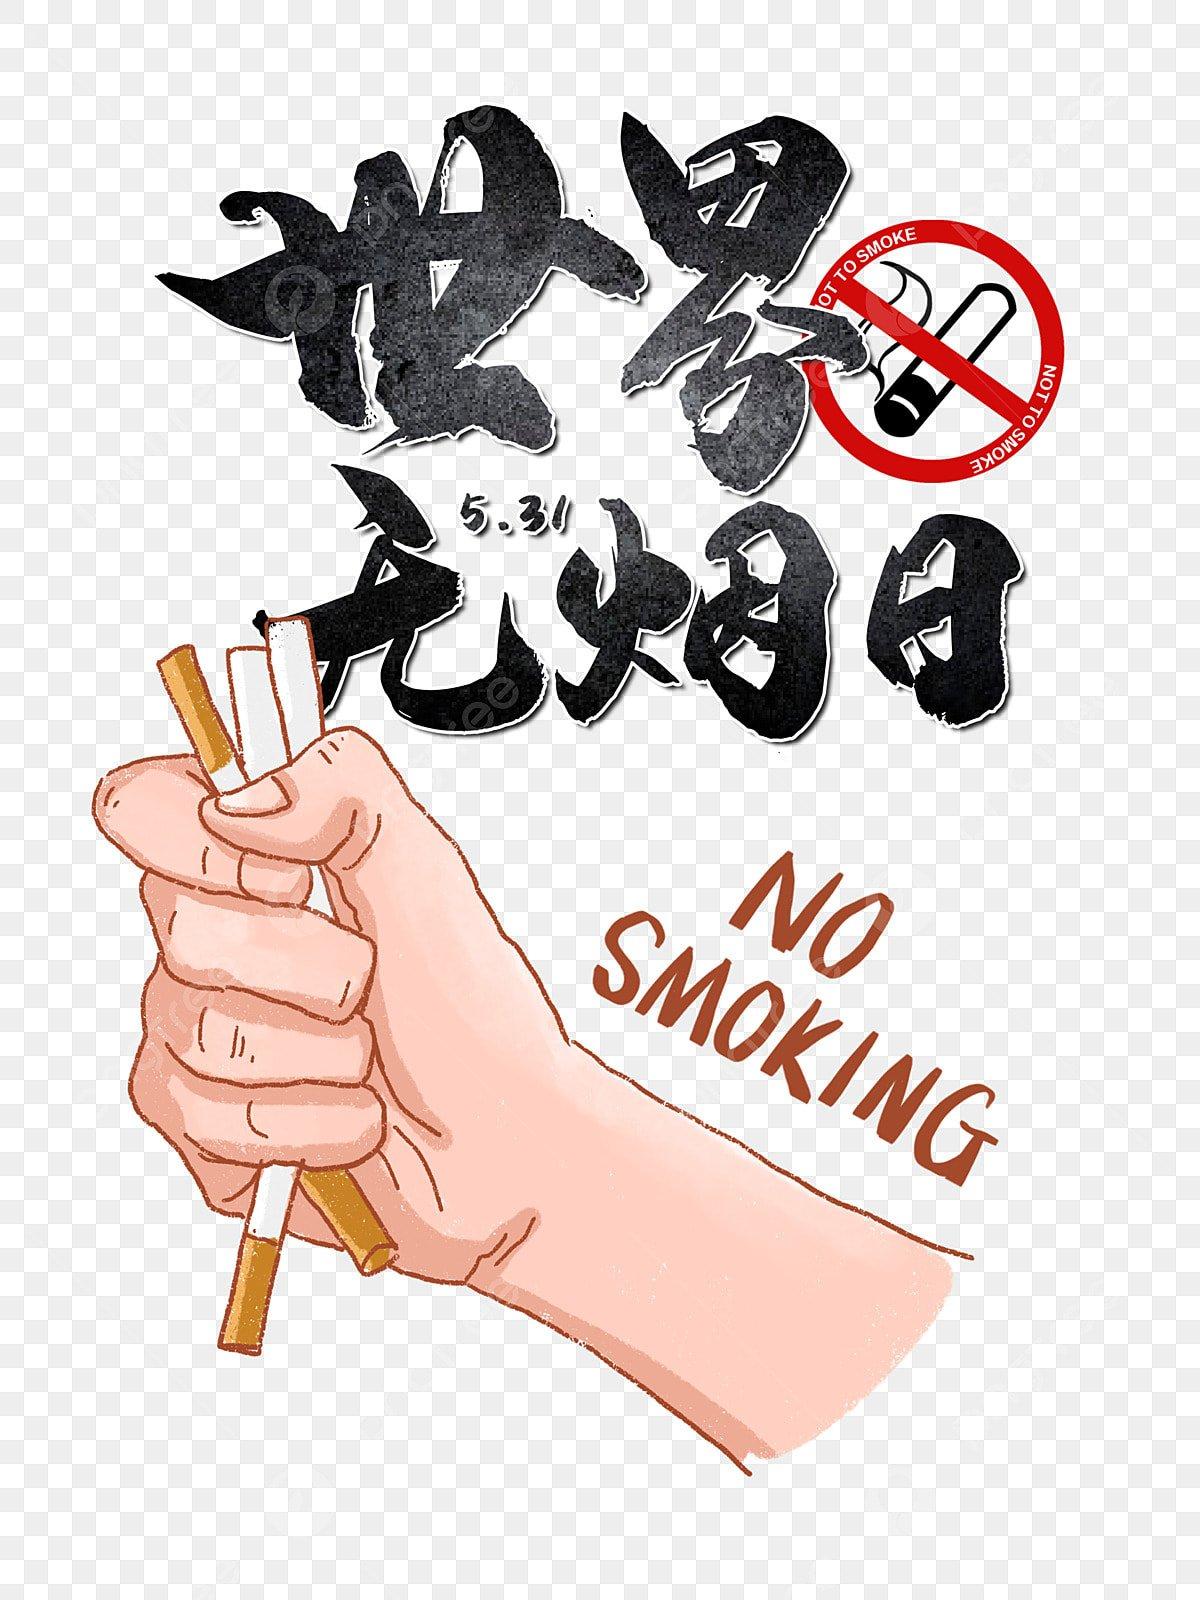 pngtree world no tobacco dayno smoking png image 5418637